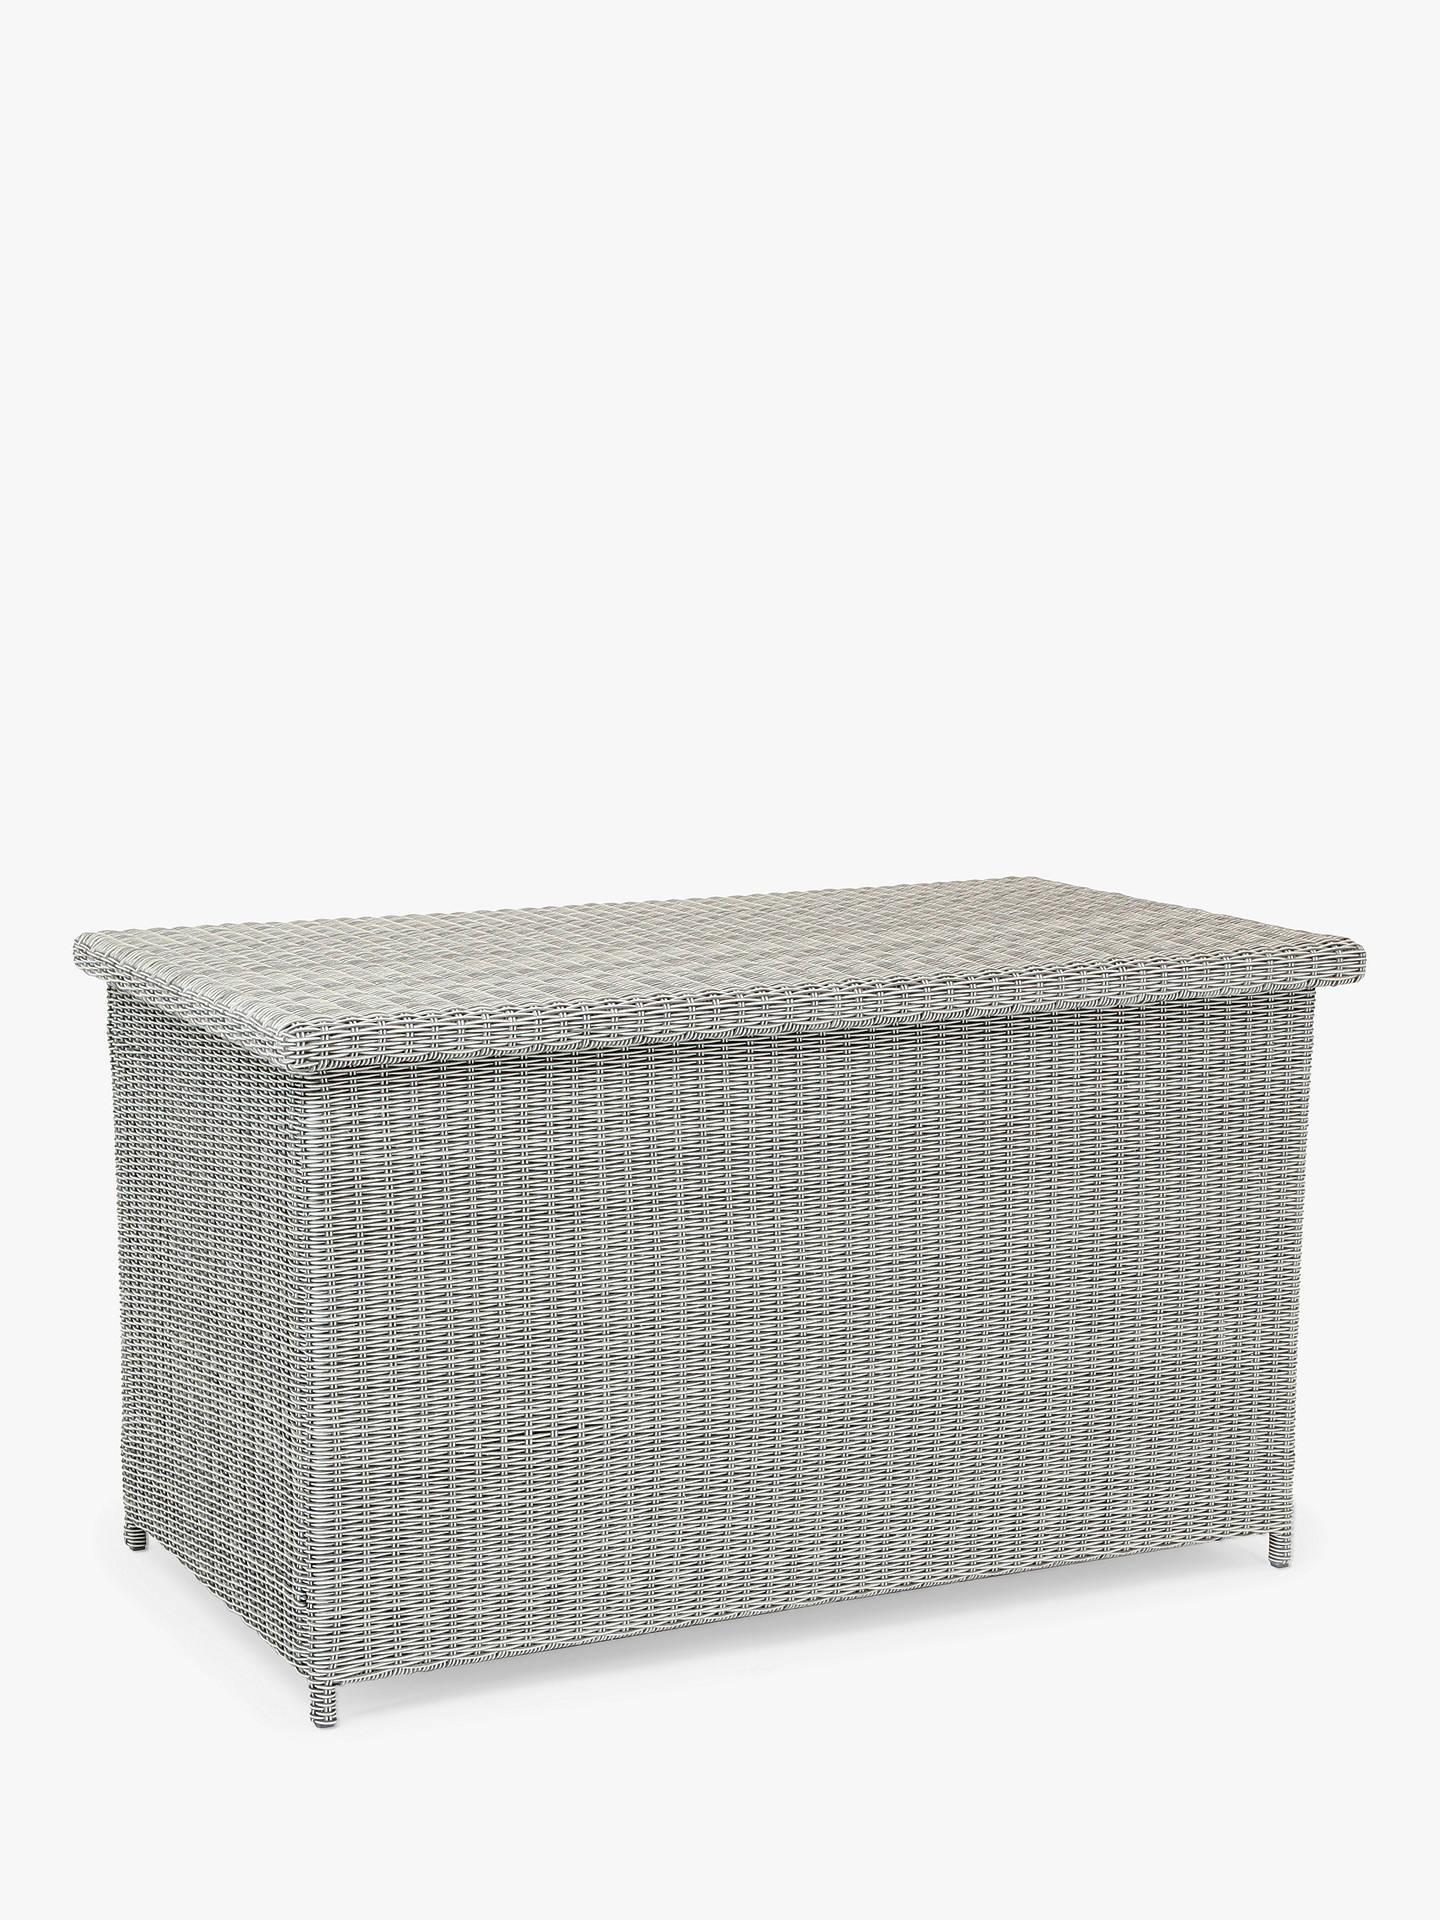 Kettler Palma Outdoor Cushion Storage Box White Wash